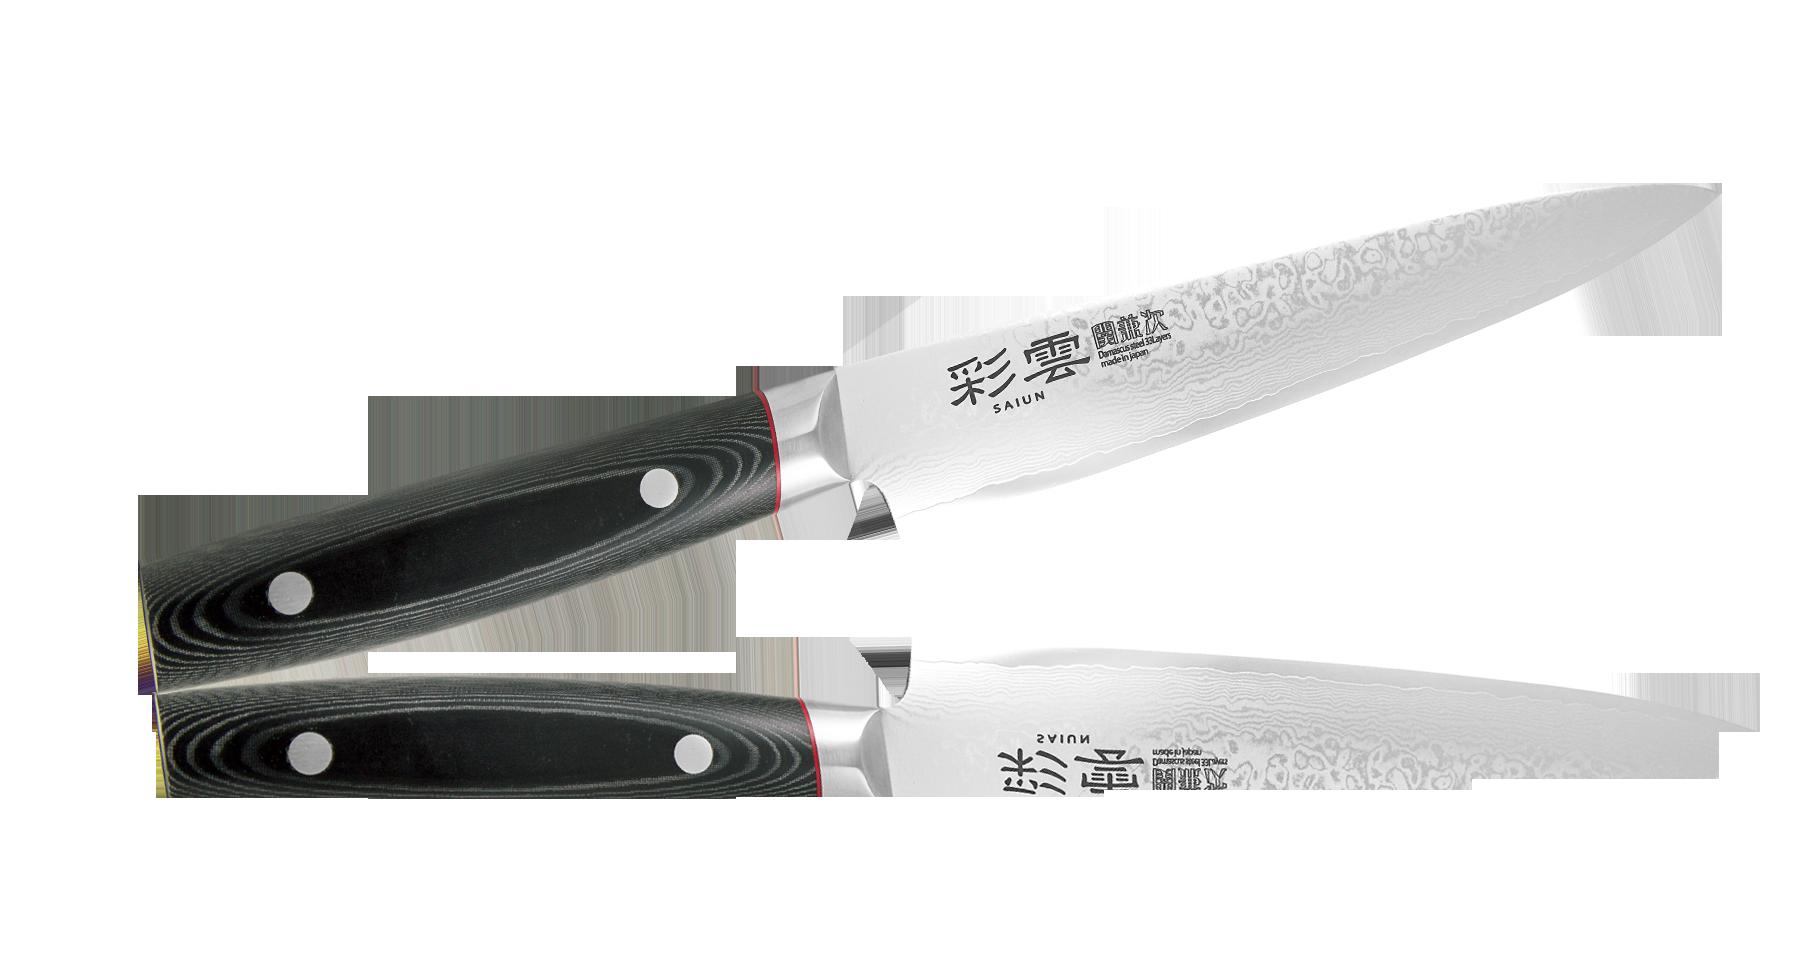 Нож для тонкой нарезки Kanetsugu Saiun Damascus 210 мм, сталь VG-10Ножи филейные<br>Нож для тонкой нарезки Kanetsugu Saiun Damascus 210 мм, сталь VG-10<br>